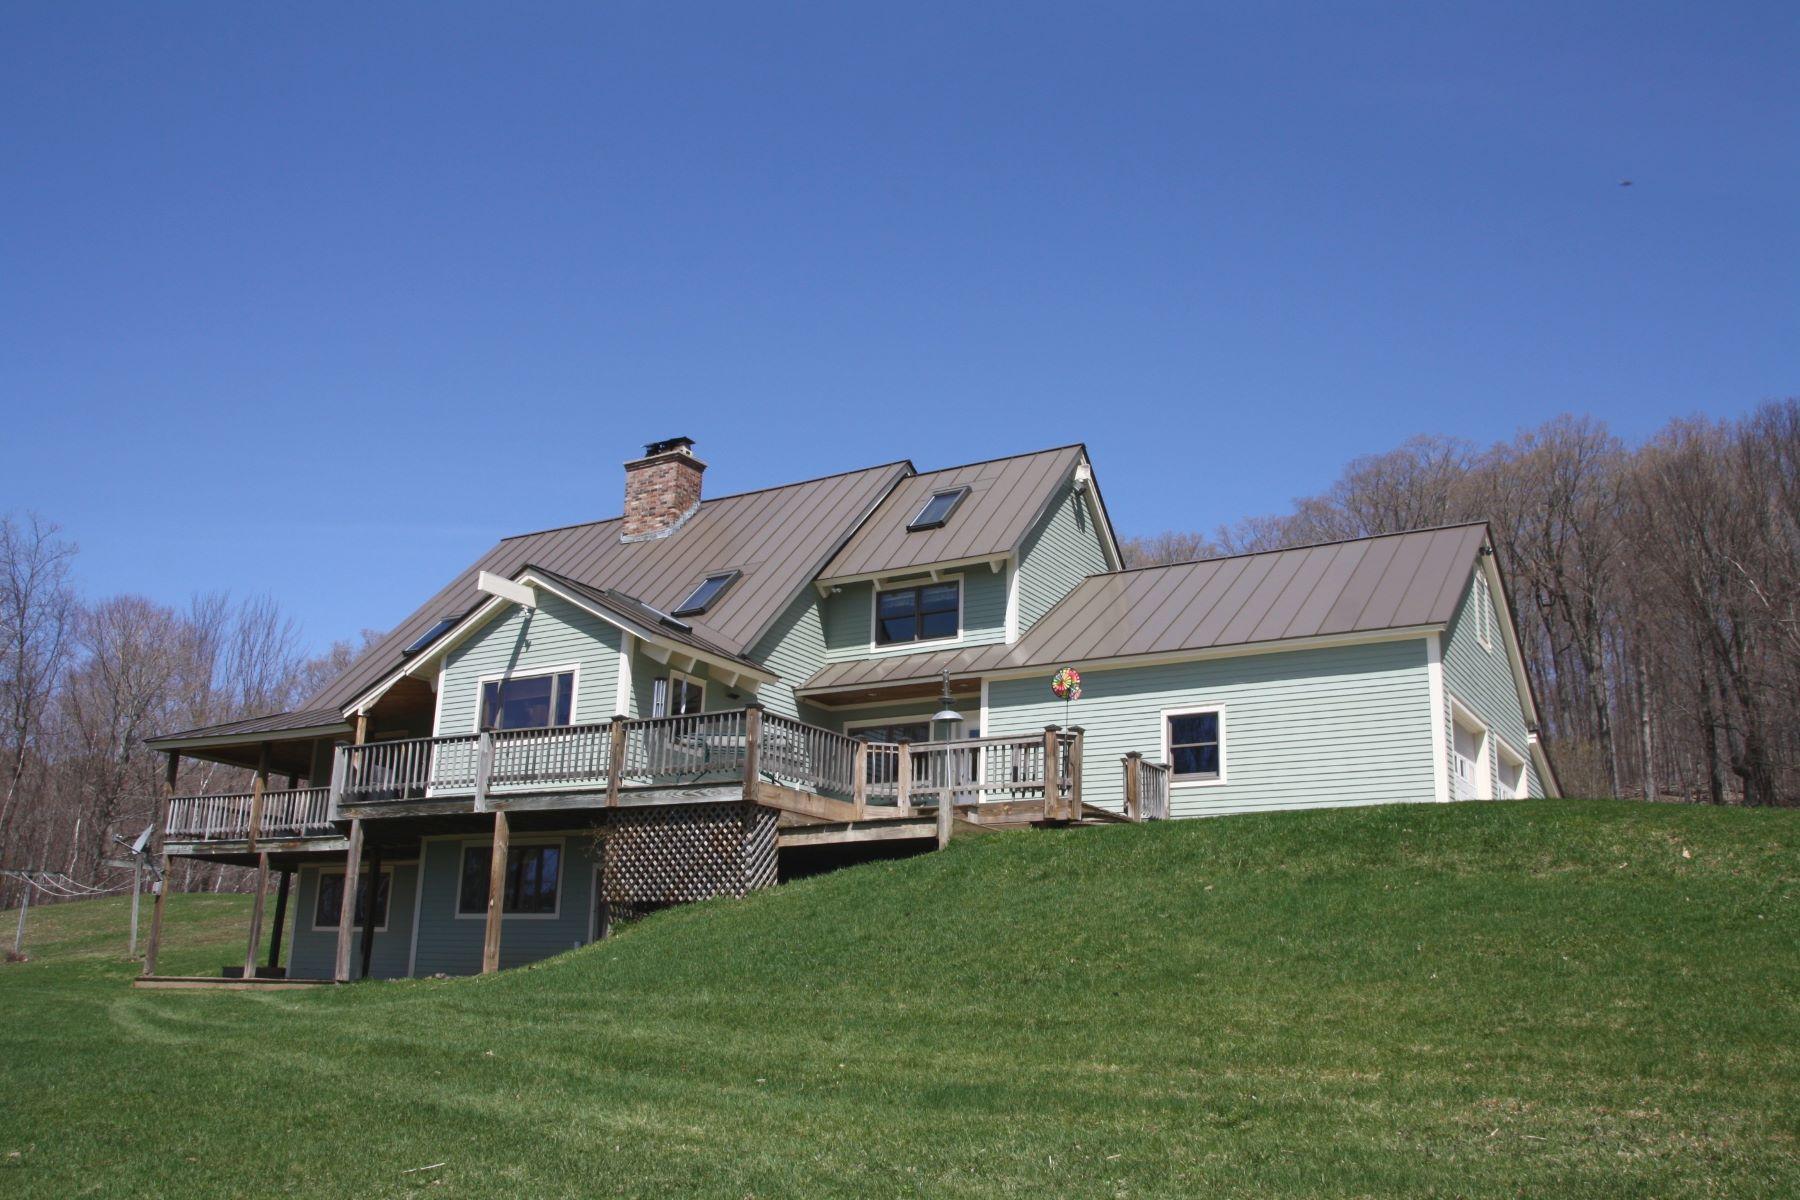 Villa per Vendita alle ore 387 Mitchell Road, Shrewsbury 387 Mitchell Rd Shrewsbury, Vermont, 05738 Stati Uniti